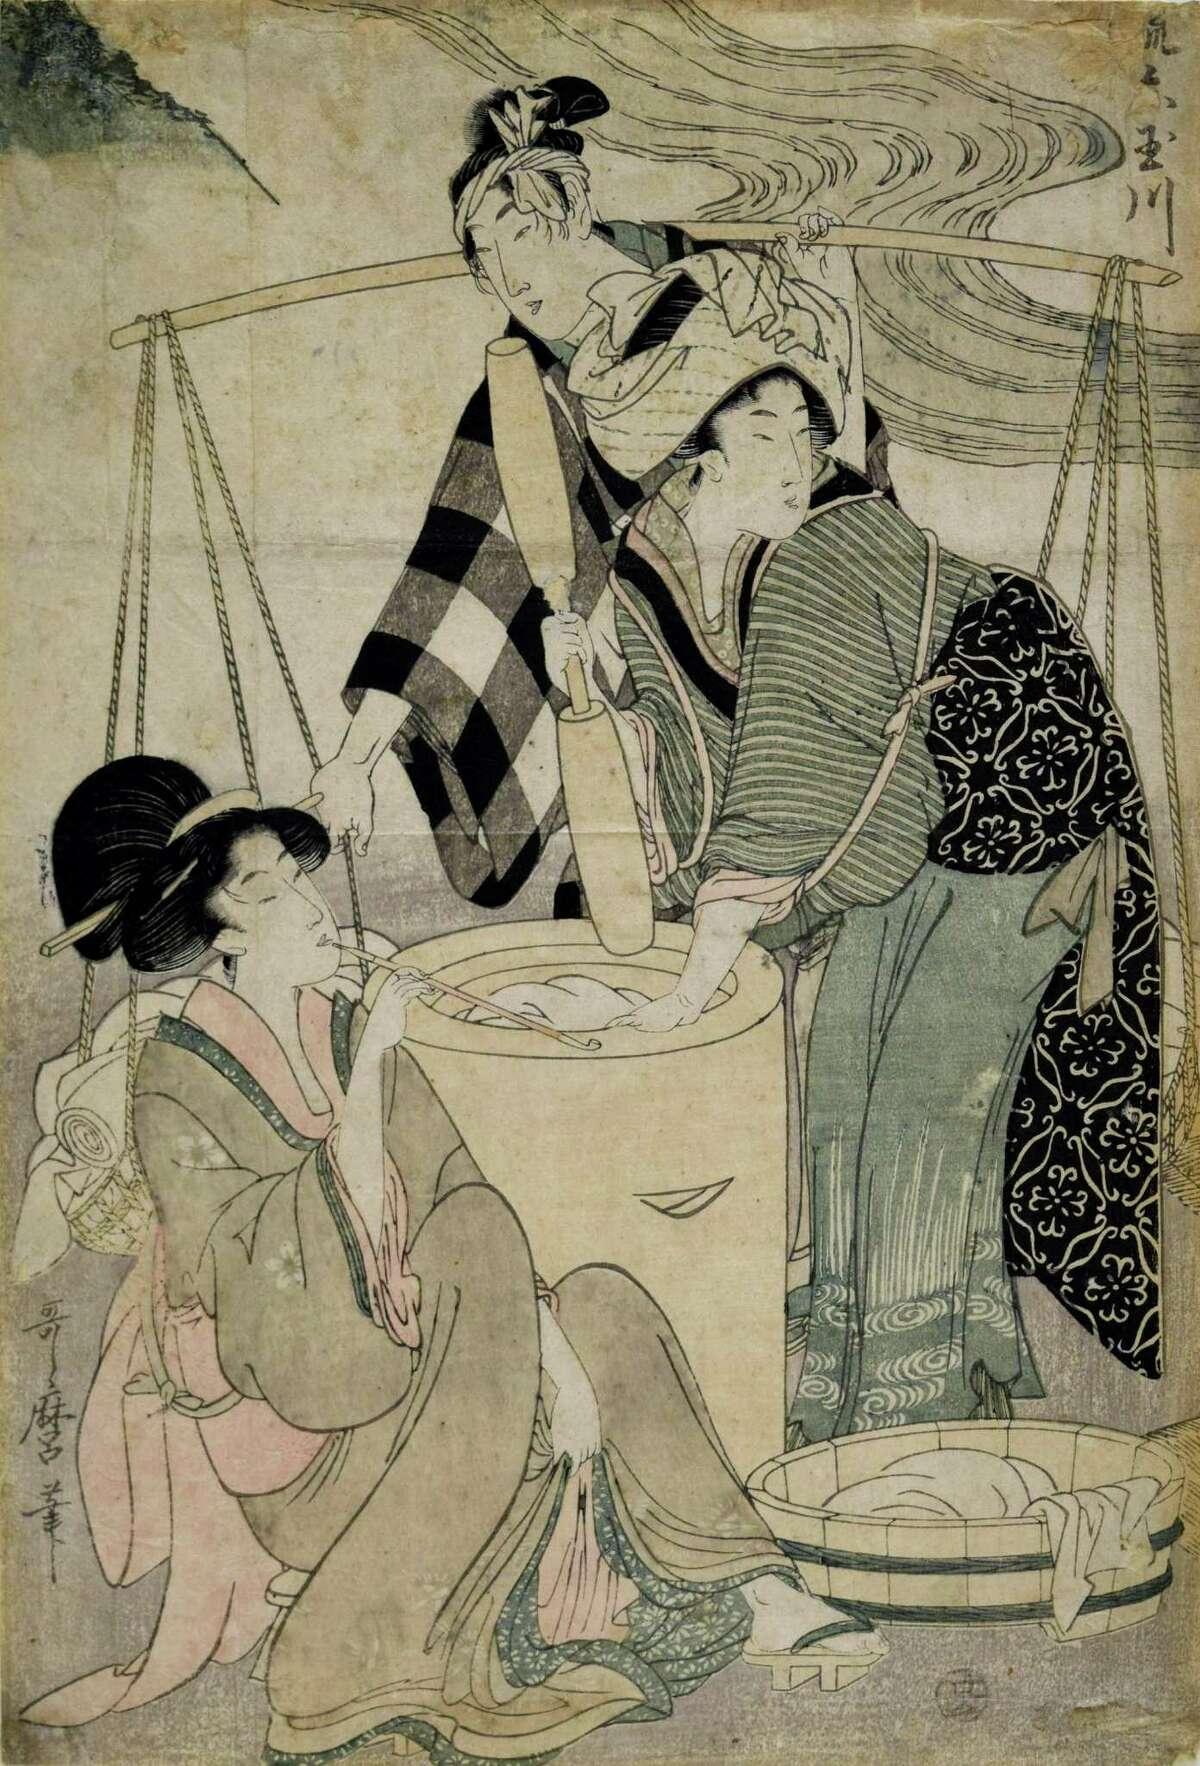 "Kitagawa Utamaro (Japanese, 1753-1806) Mutamagawa, will be included in the Bruce Museum's ""Floating Beauty"" exhibit."